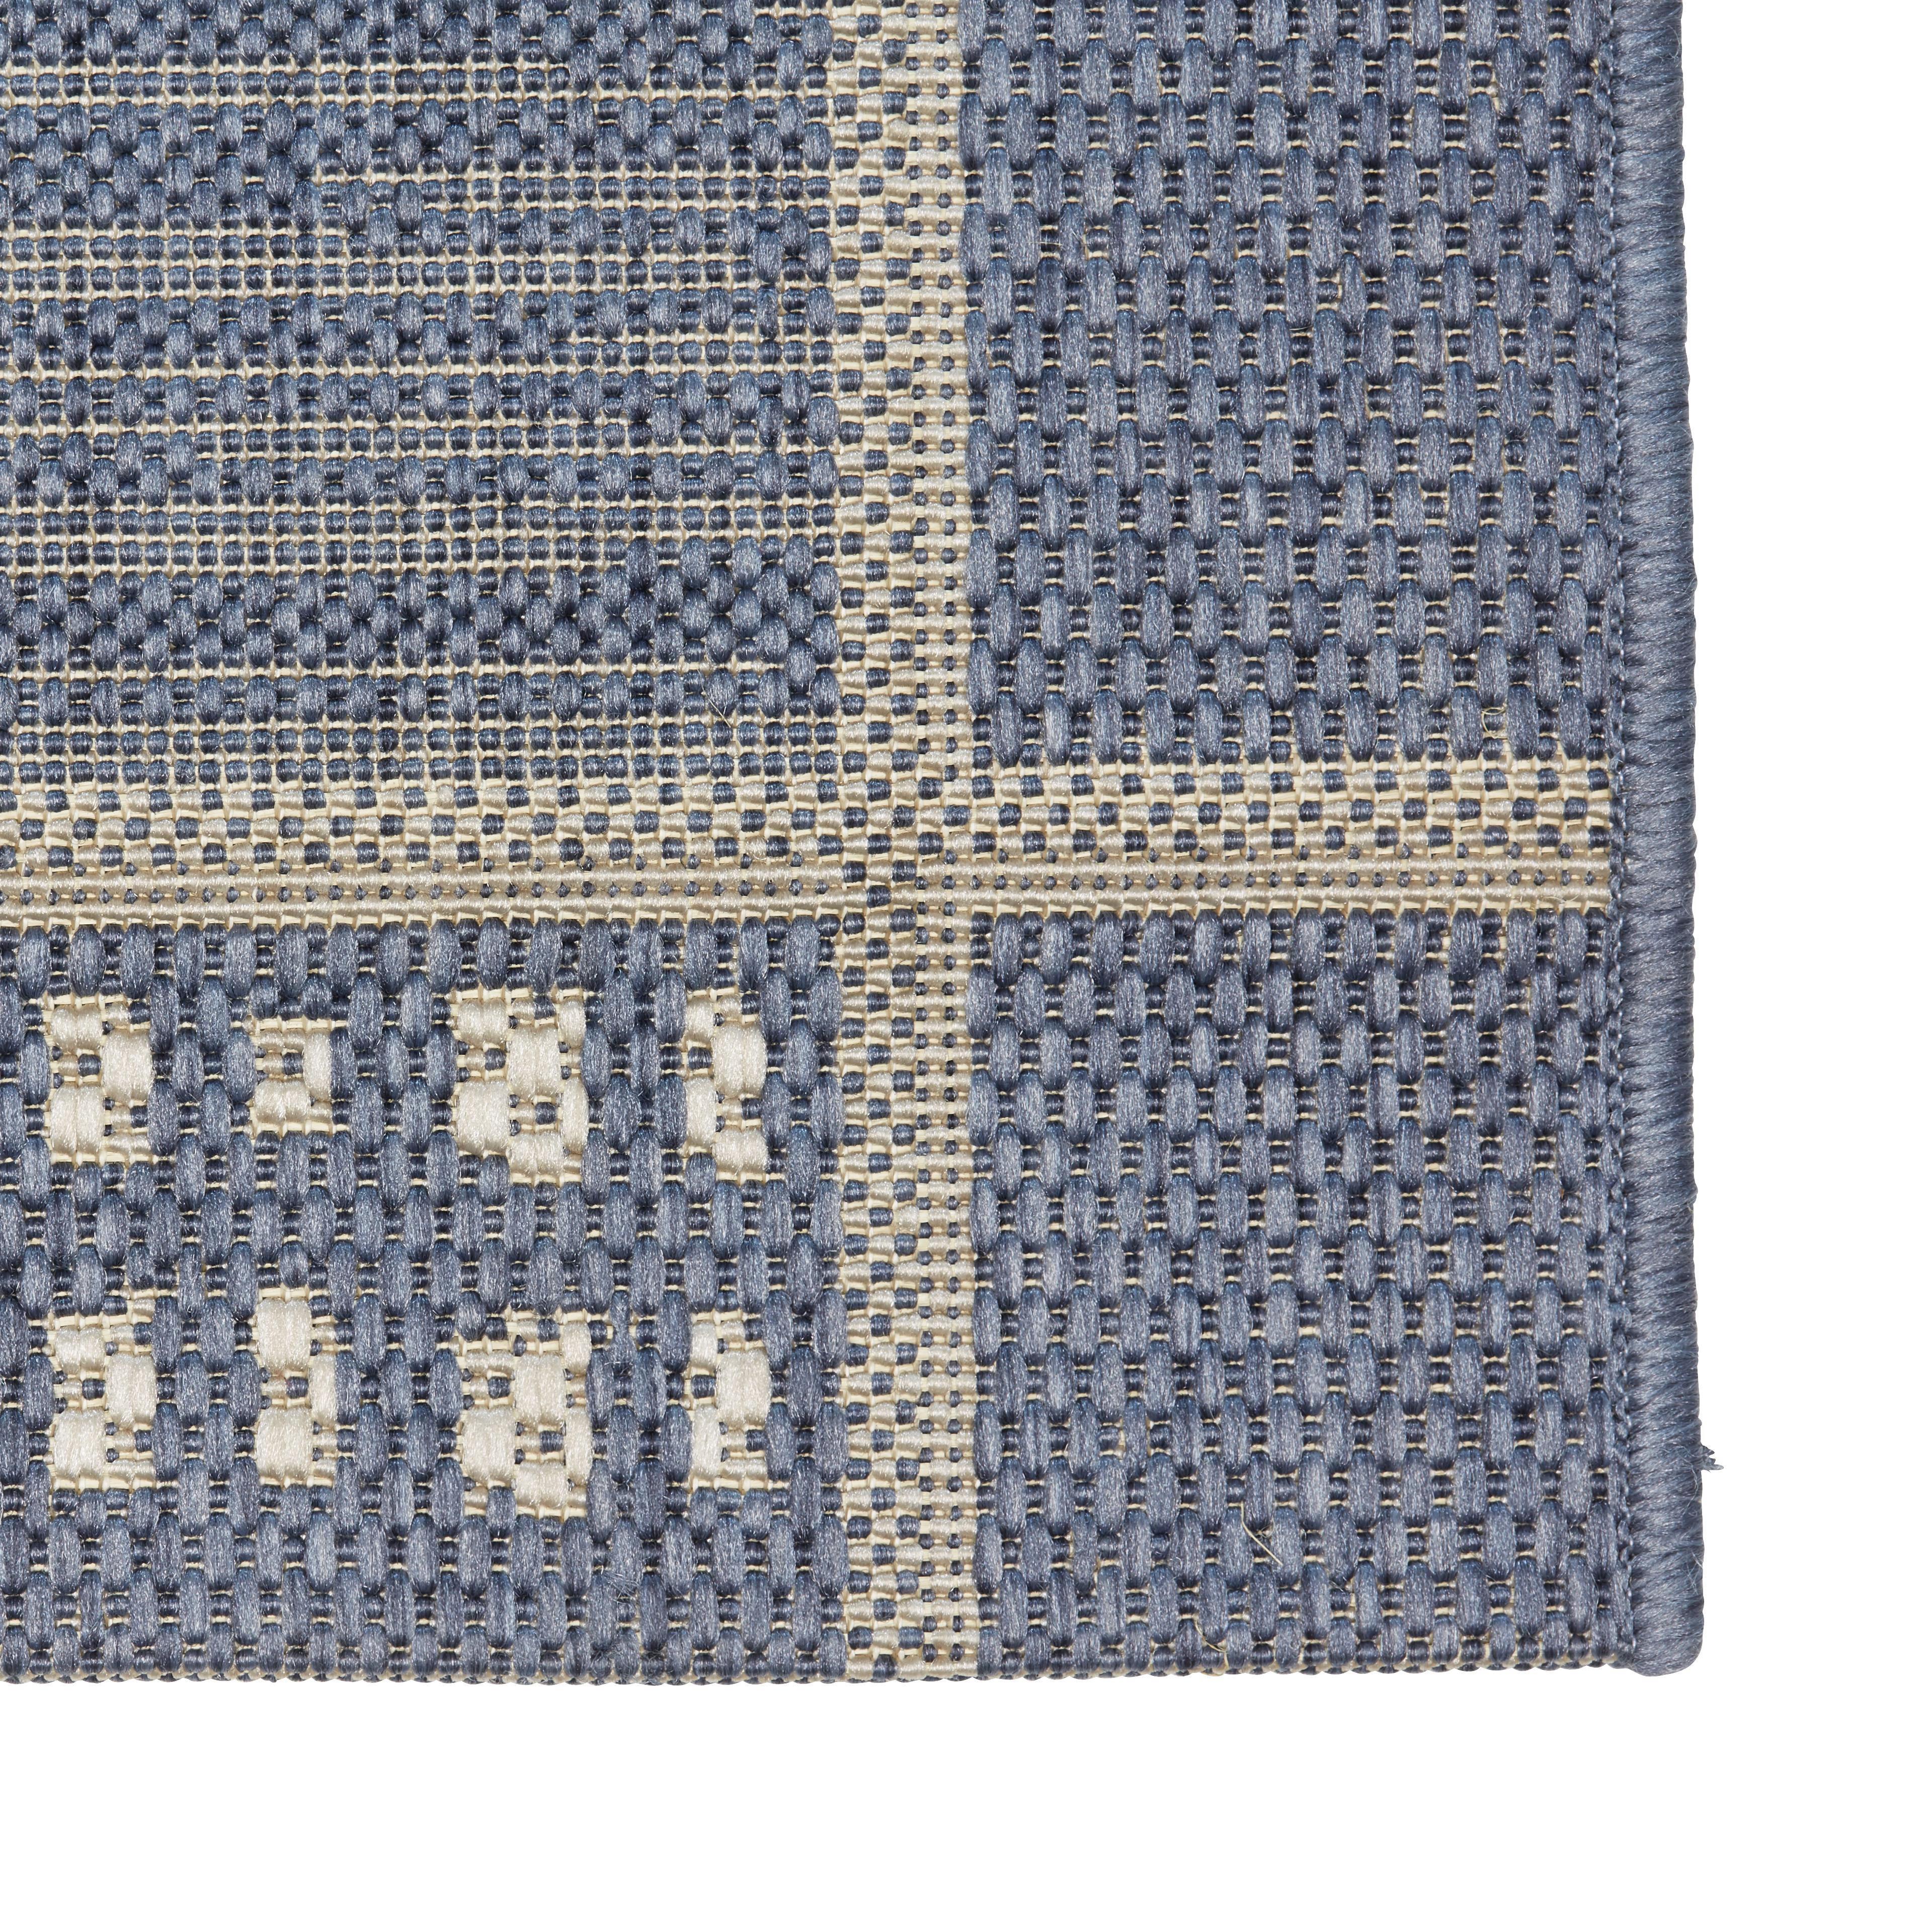 Flachwebeteppich Emil in Blau, ca. 80x200cm - Blau, KONVENTIONELL, Textil (80/200cm) - MÖMAX modern living